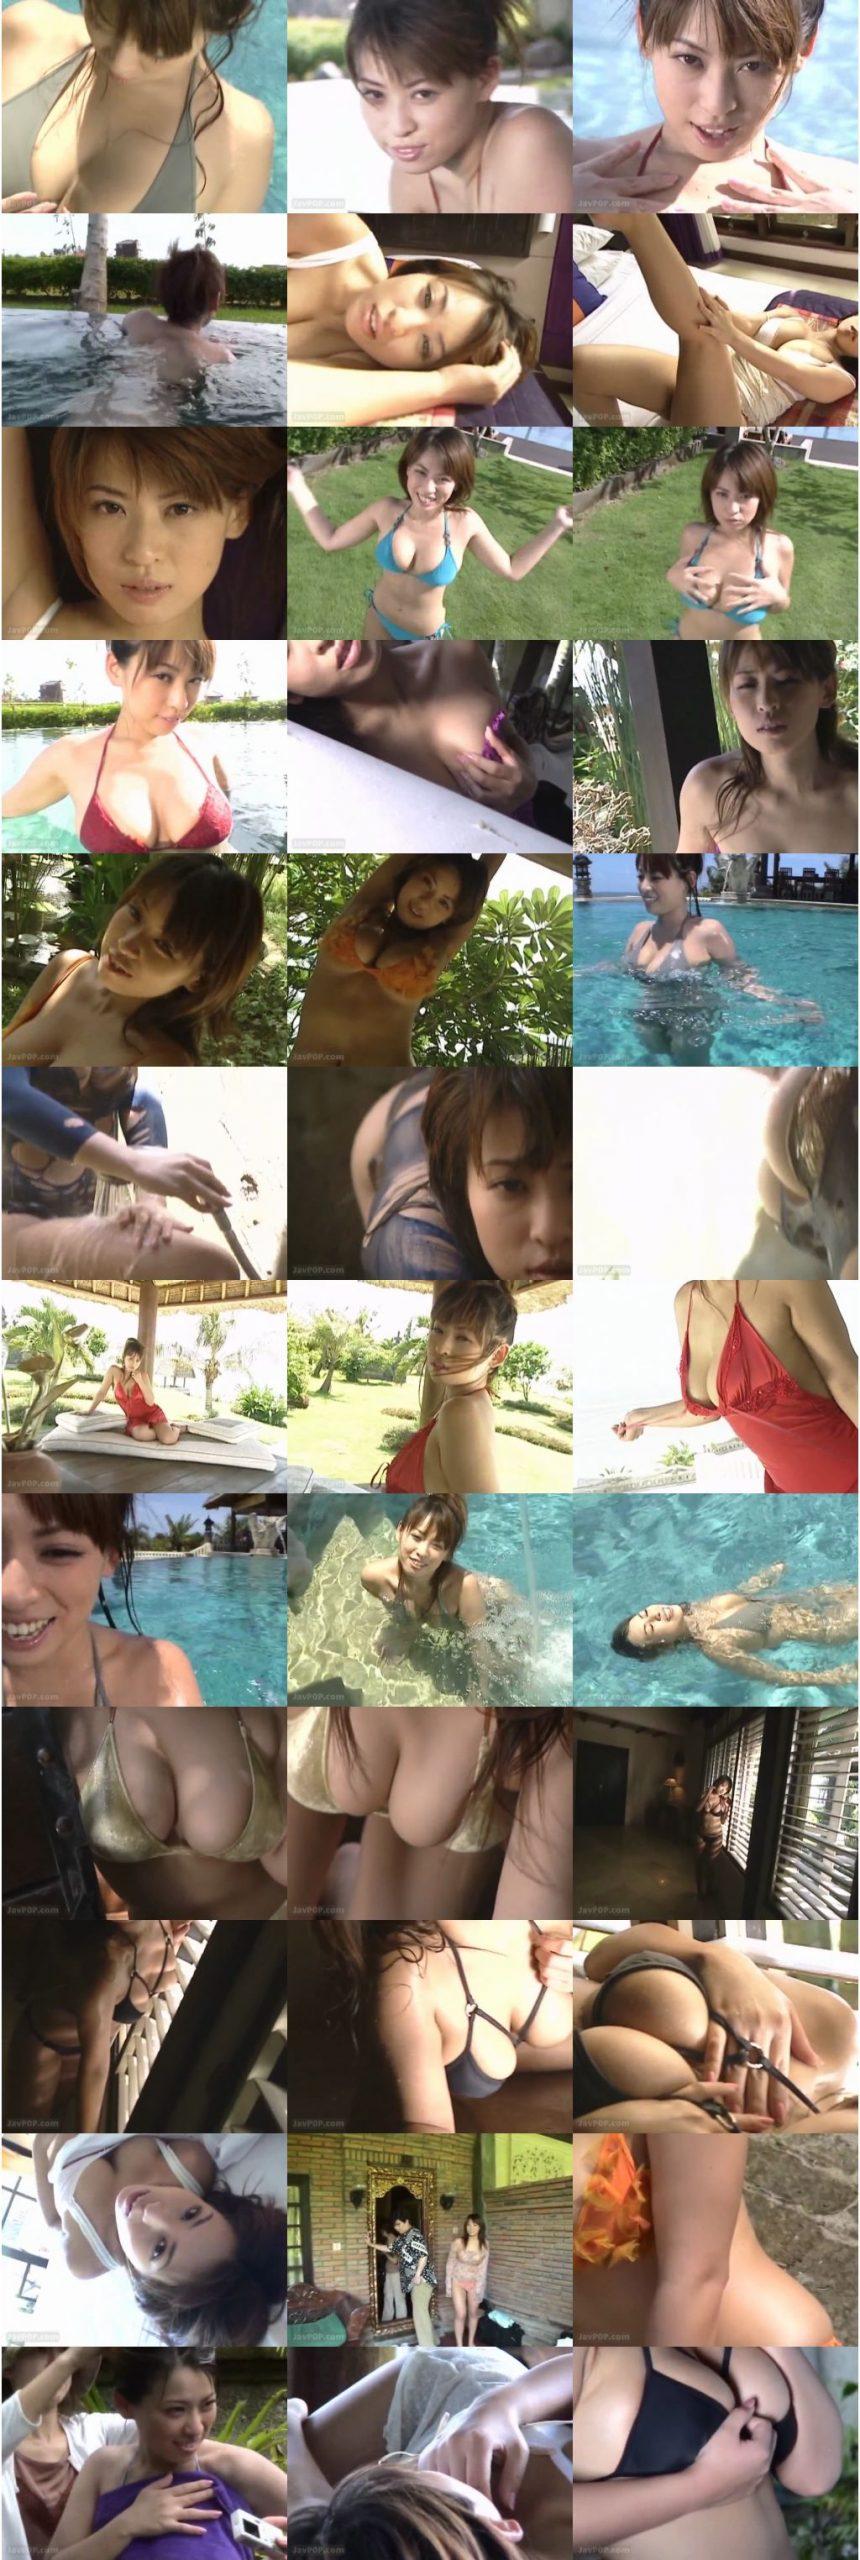 tsdv 11967 nozomi takeuchi s scaled - [TSDV-11967] 竹内のぞみ Nozomi Takeuchi – I wish…